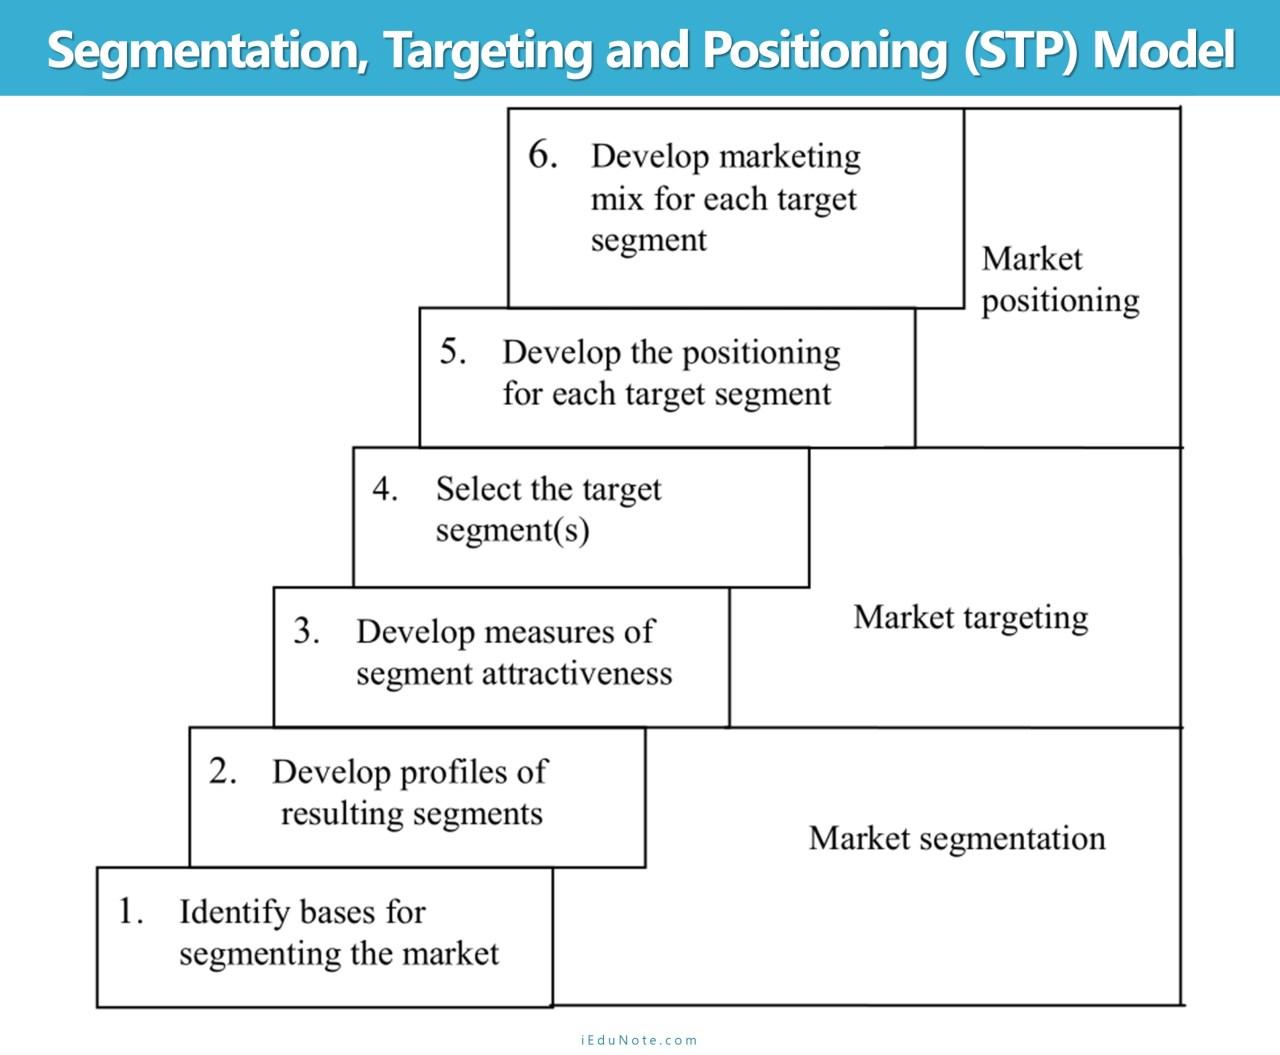 3 Steps of Segmentation, Targeting, and Positioning (STP) Model